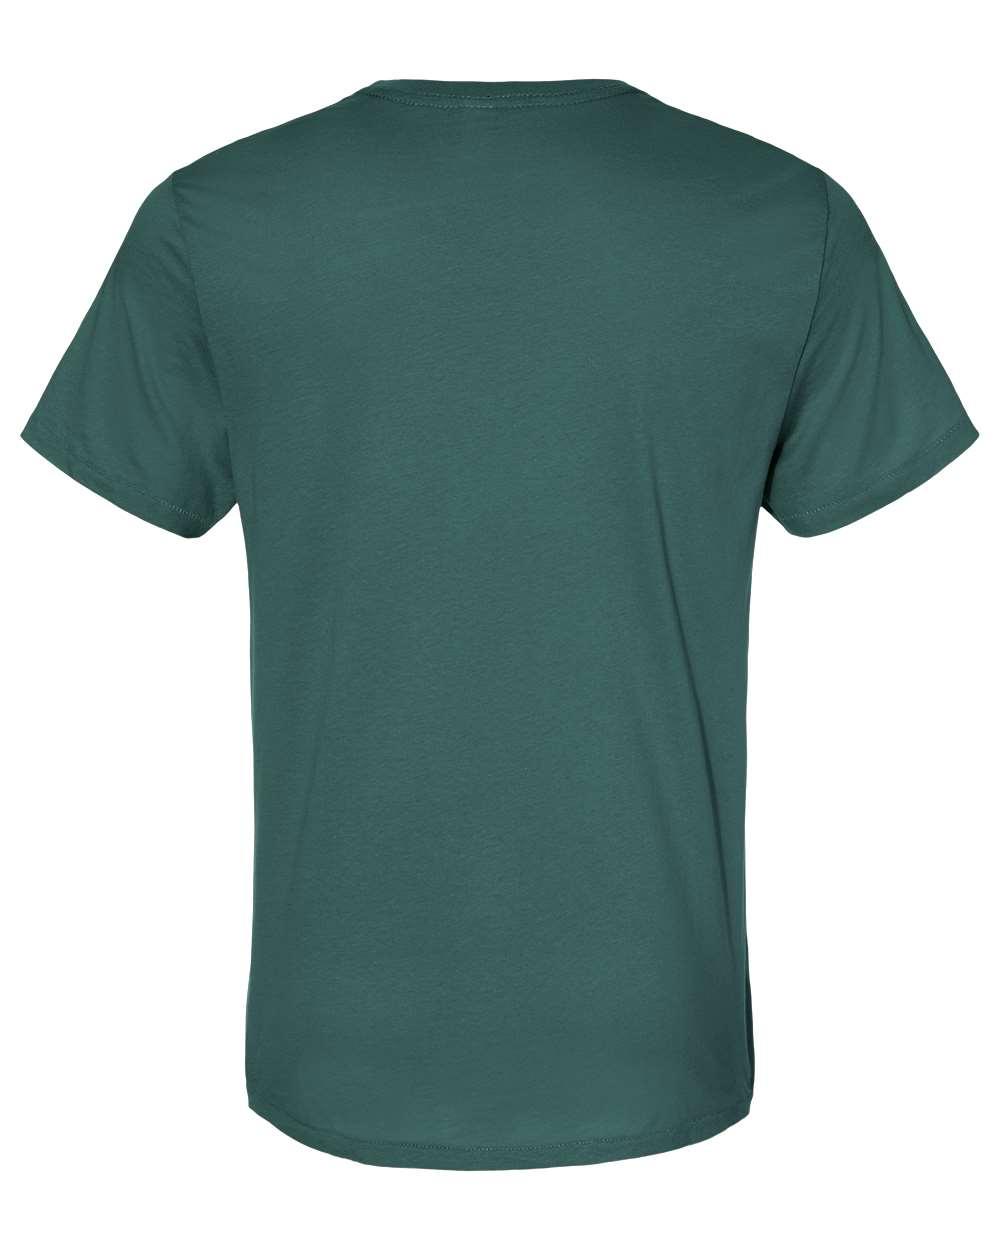 Alternative Mens Organic Crewneck Tee T Shirt Short Sleeve 6005 up to 3XL